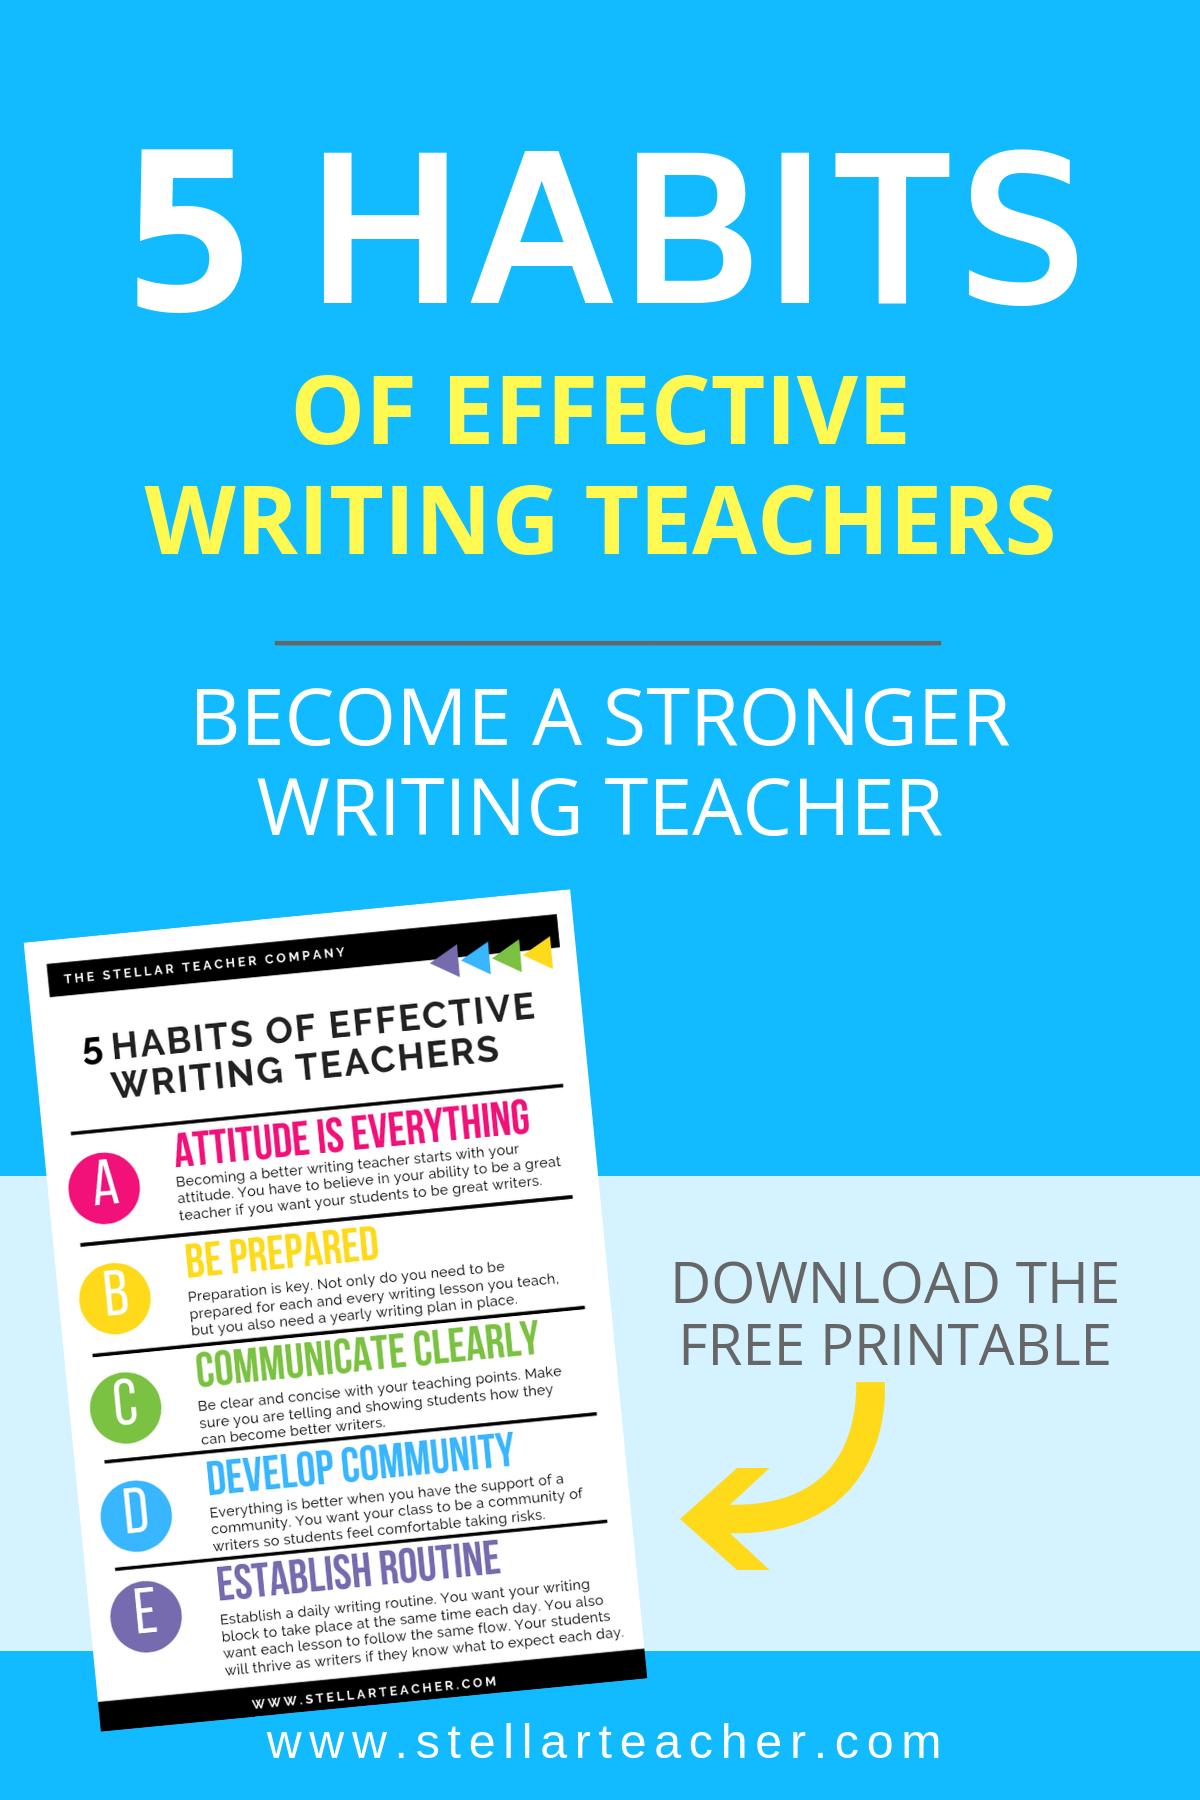 The Stellar Teacher Co. Habits of Effective Writing Teacher Pin.png